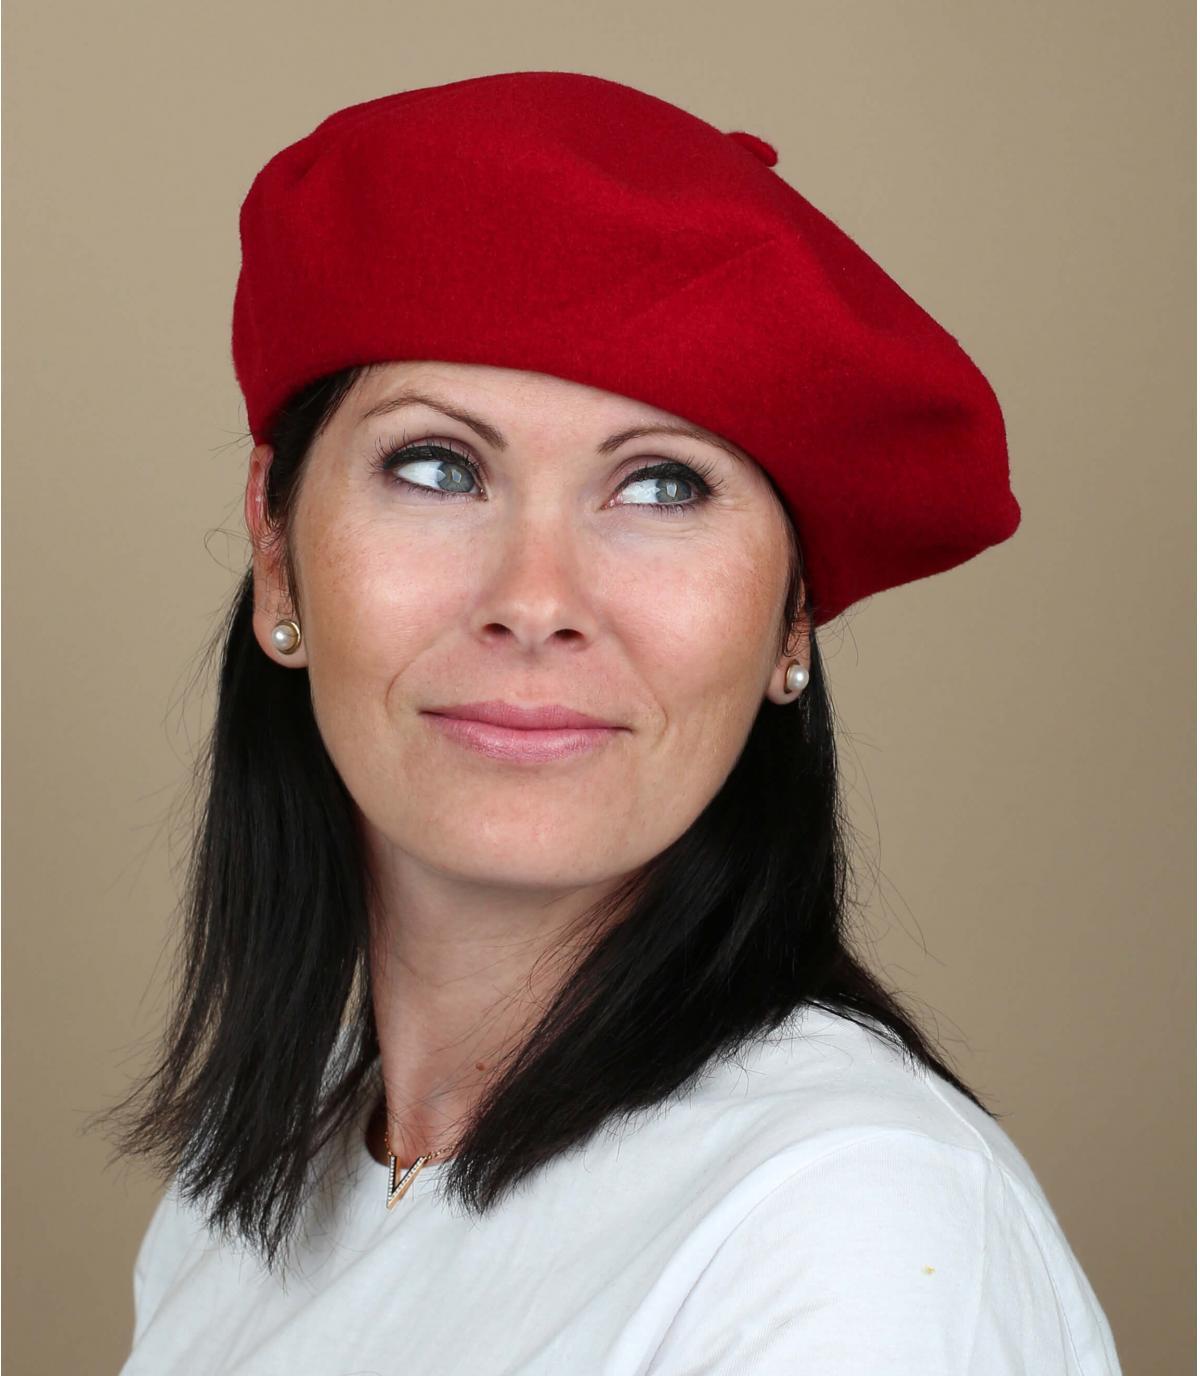 b ret rouge femme achat vente de b rets femme rouge. Black Bedroom Furniture Sets. Home Design Ideas